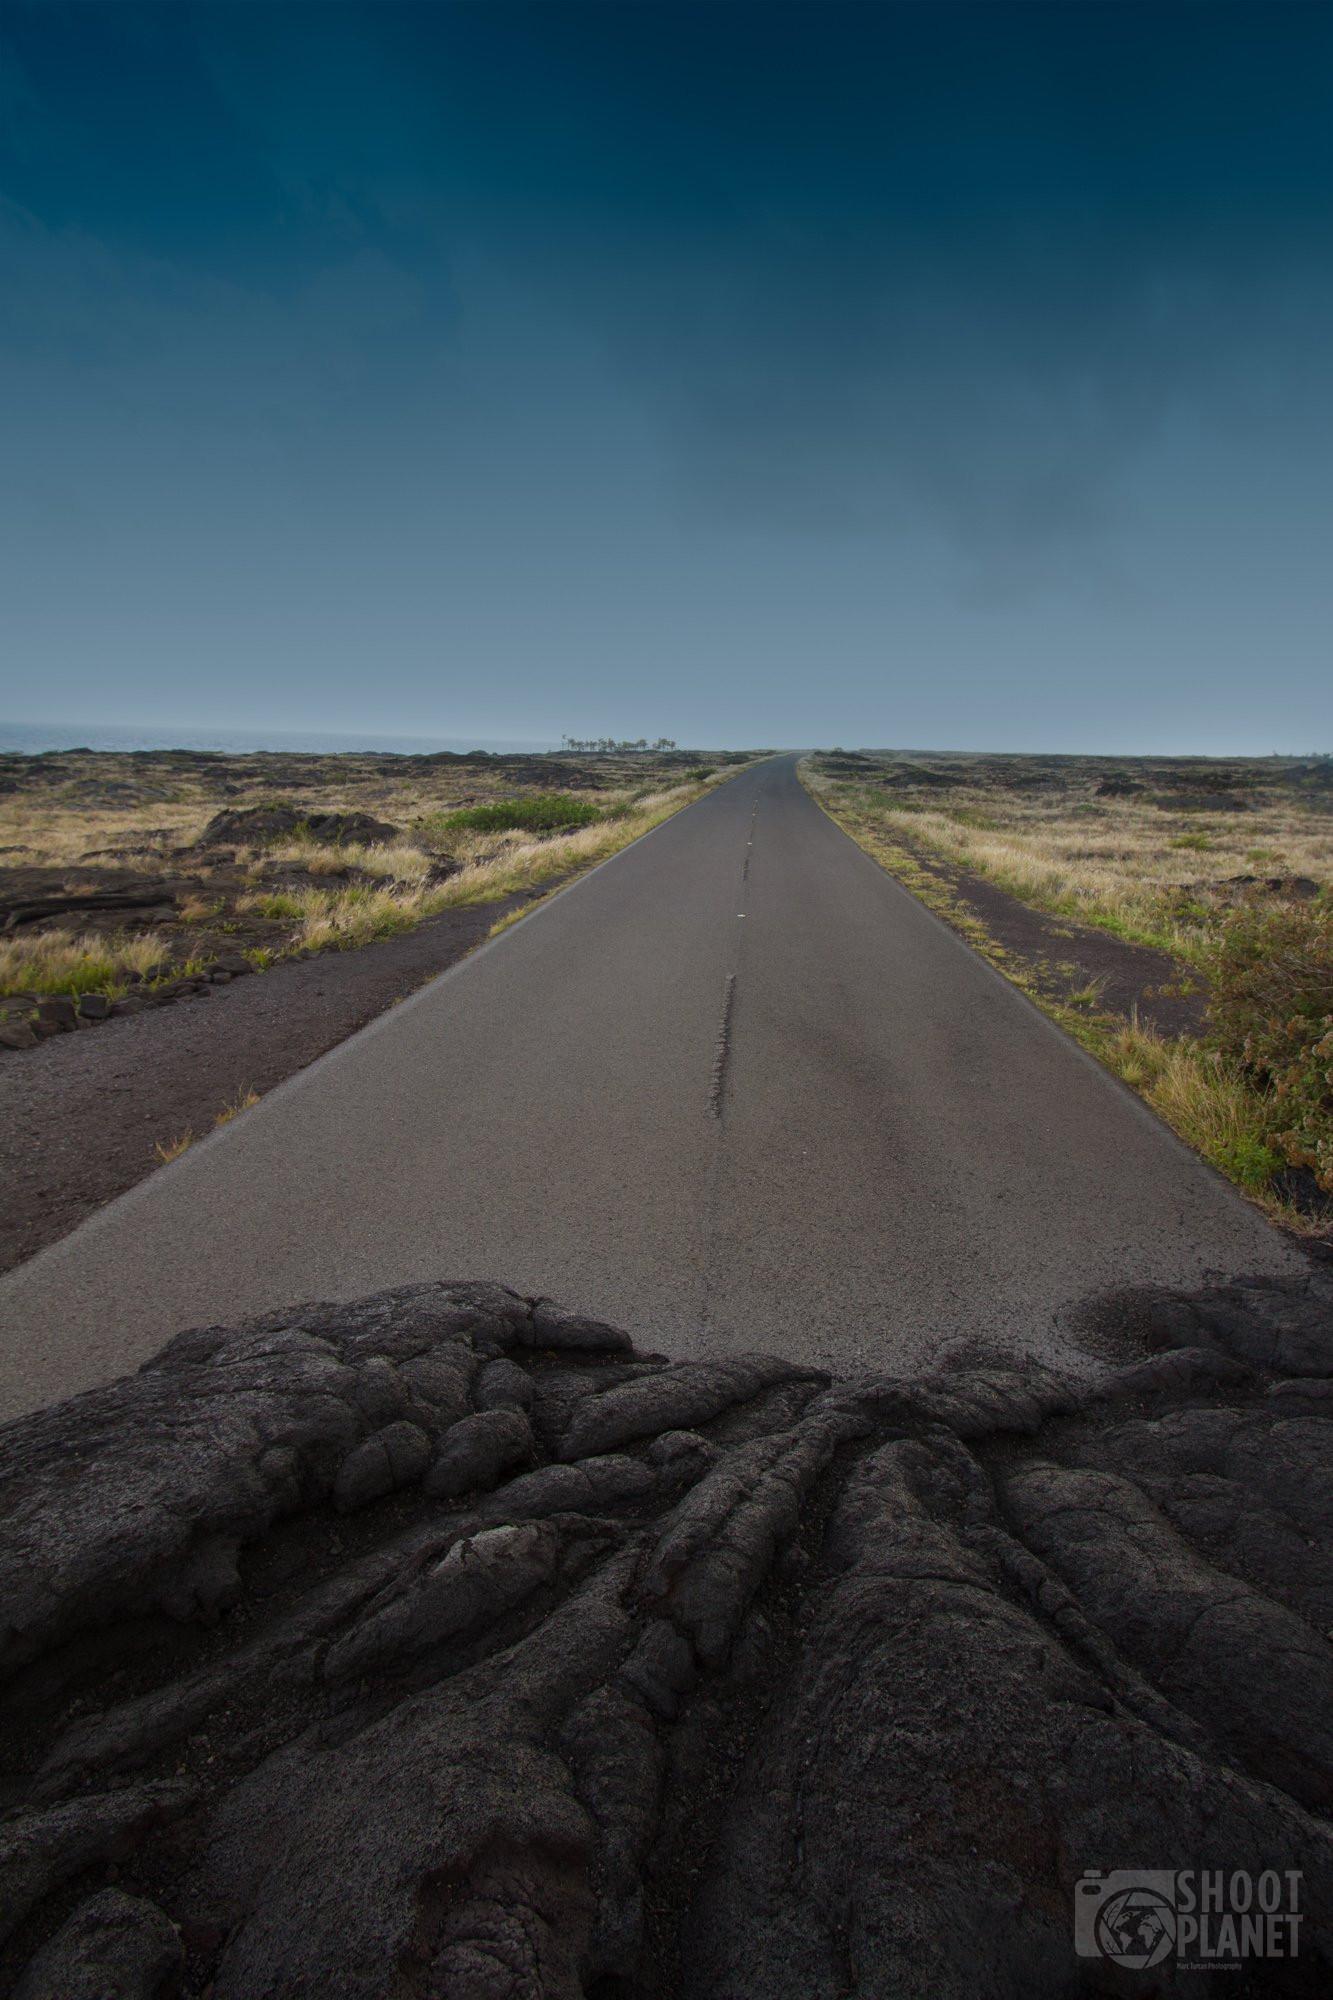 Road buried in lava rocks, Hawaii Island